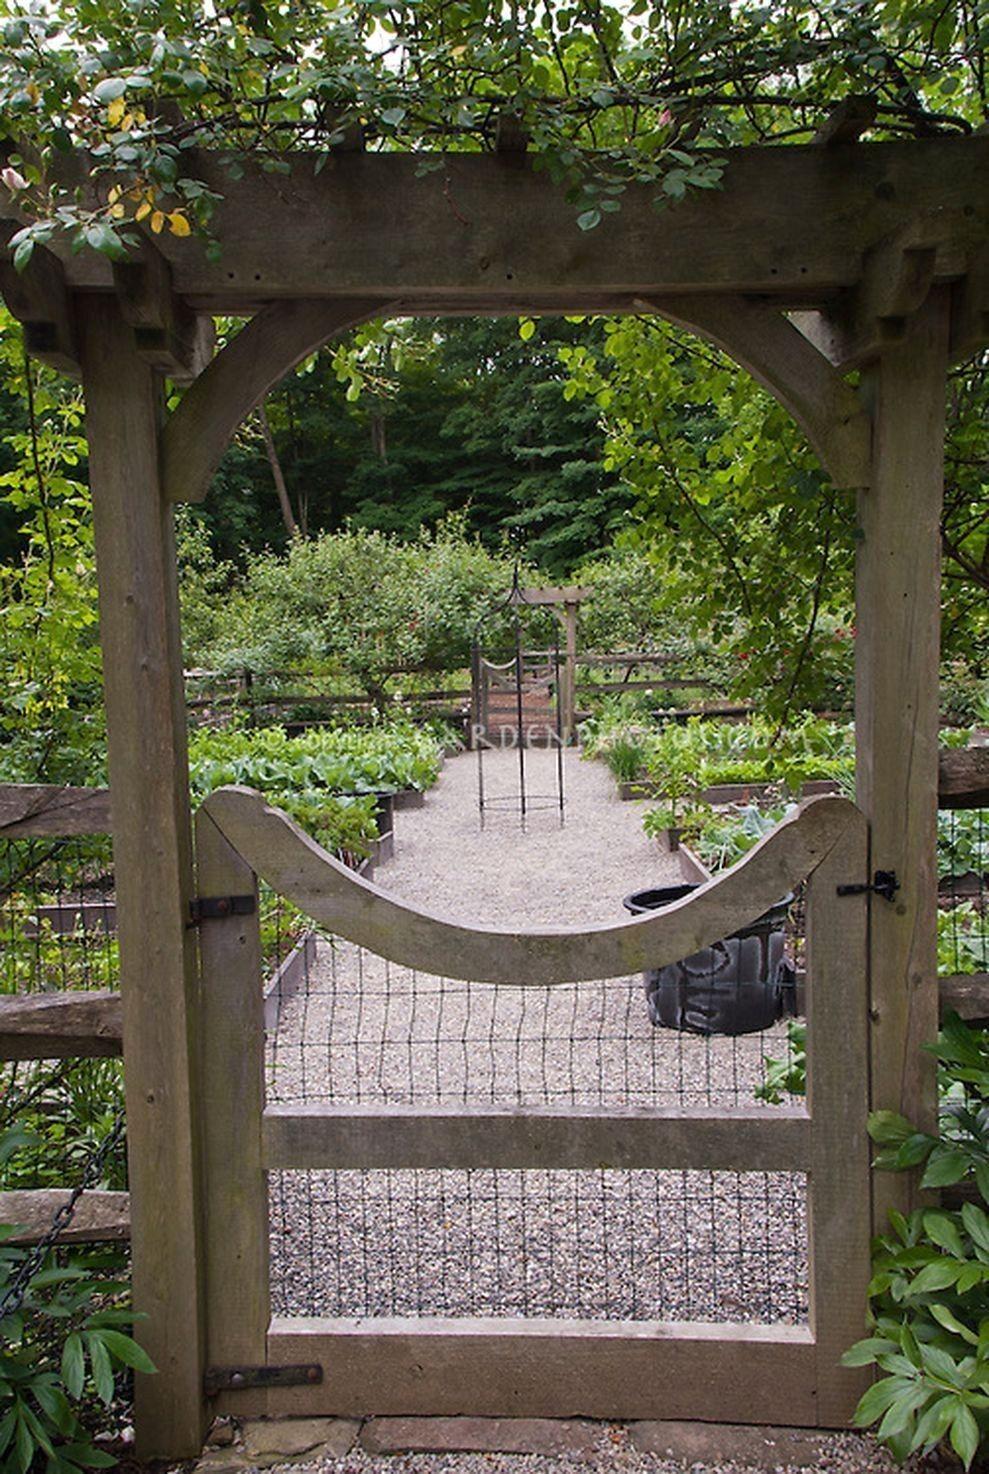 55 Best Backyard Vegetable Garden Designs Ideas Garden Gates And Fencing Garden Gate Design Vegetable Garden Design